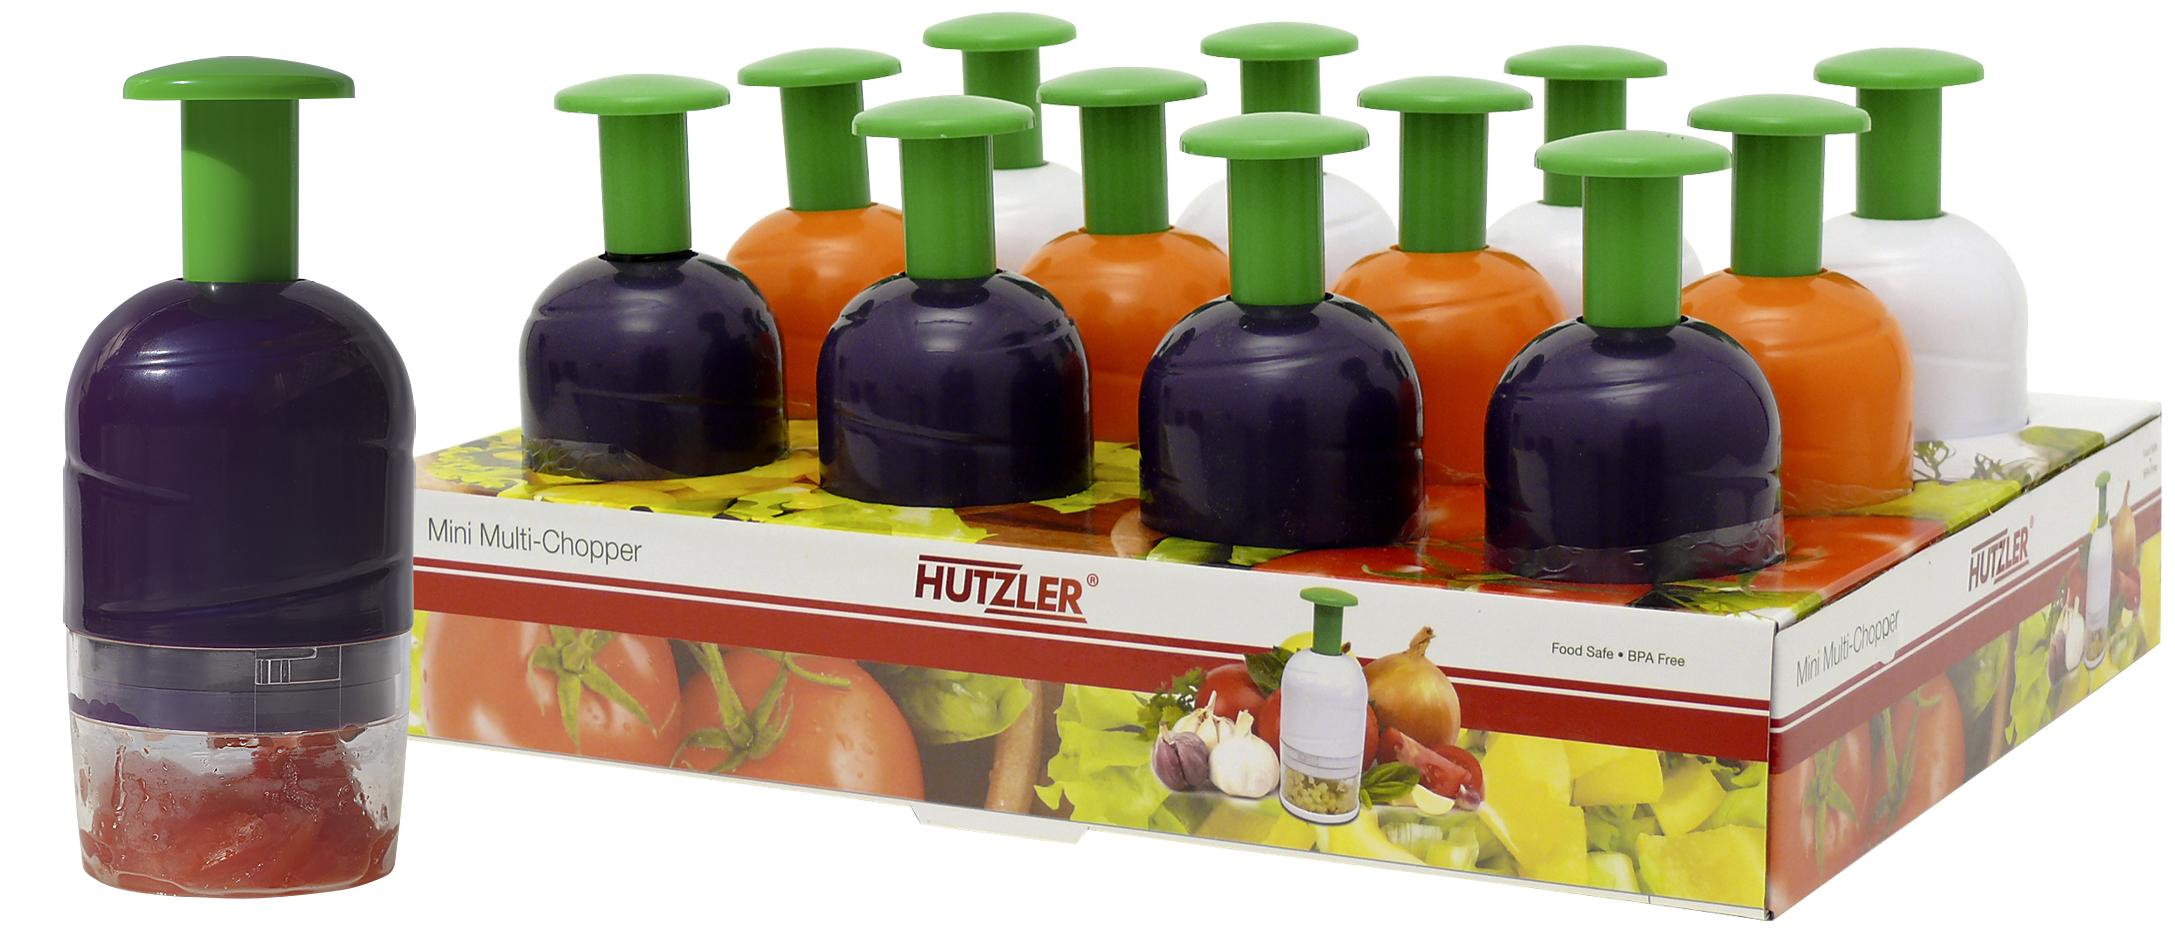 Hutzler 12-570 Mini Multi Chopper Counter Display (12 pack)